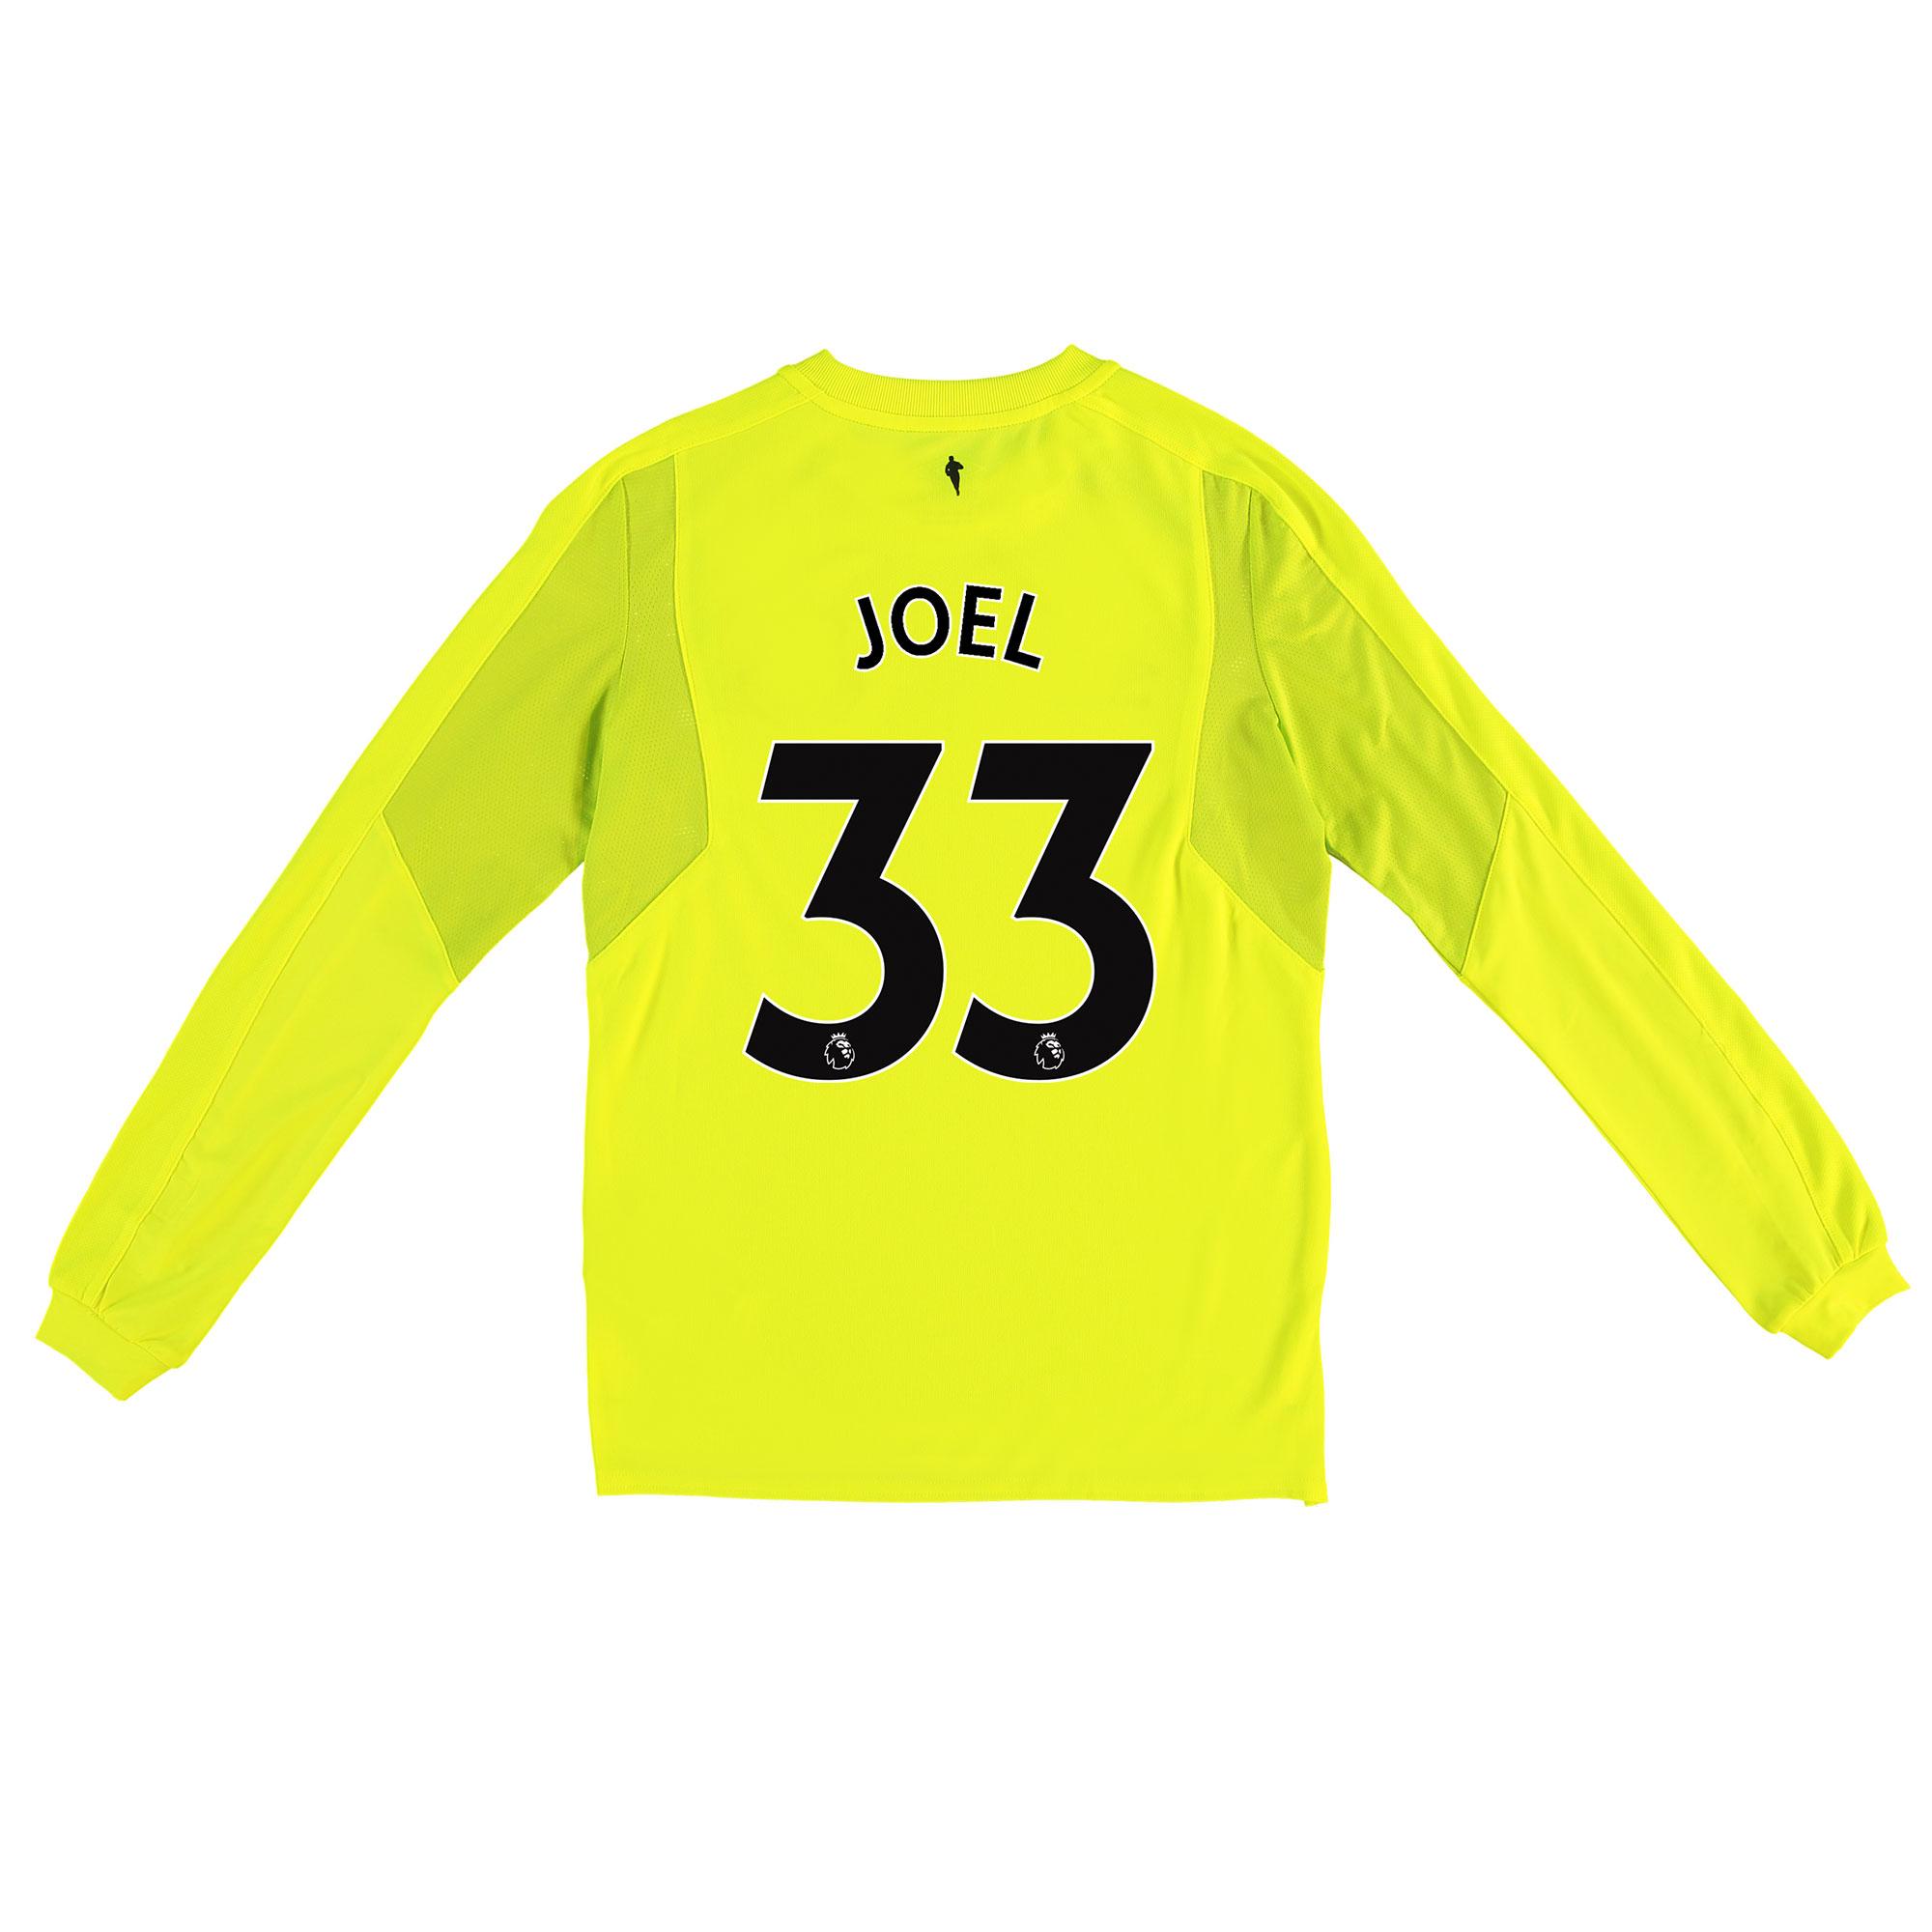 Everton Goalkeeper 3rd Shirt 2017/18 - Junior with Joel 33 printing